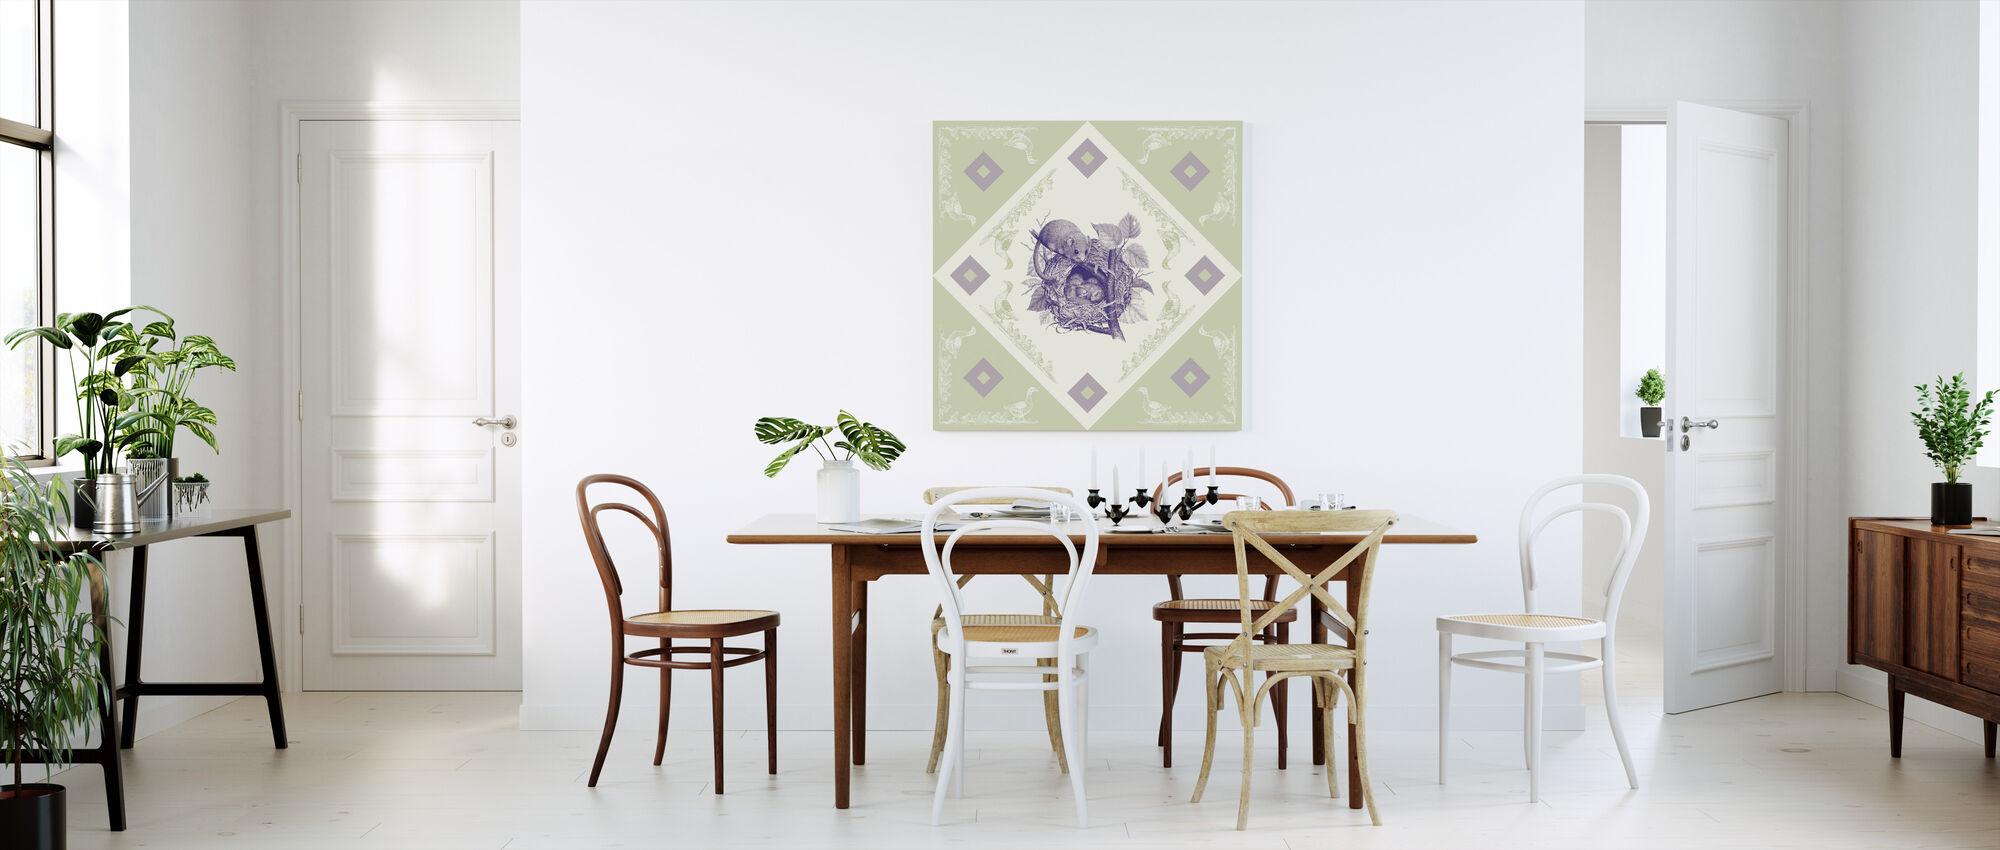 Dormouse 2 , Purple Green - Canvas print - Kitchen